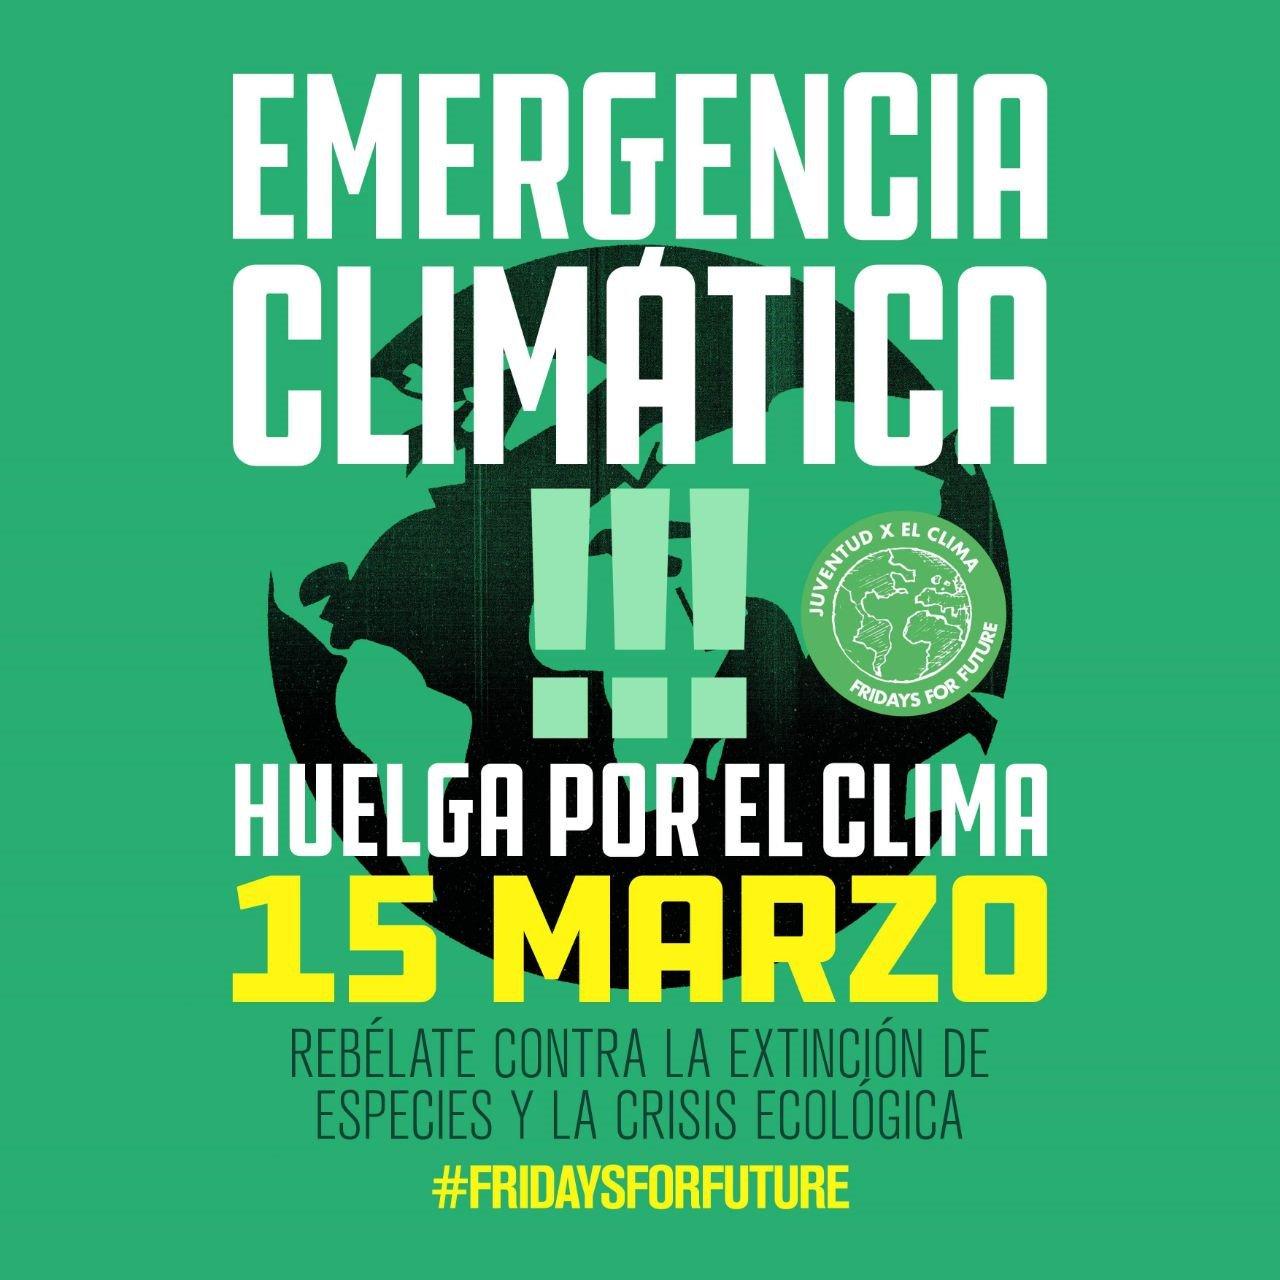 Greta Thunberg Fridays for future huelga por el clima